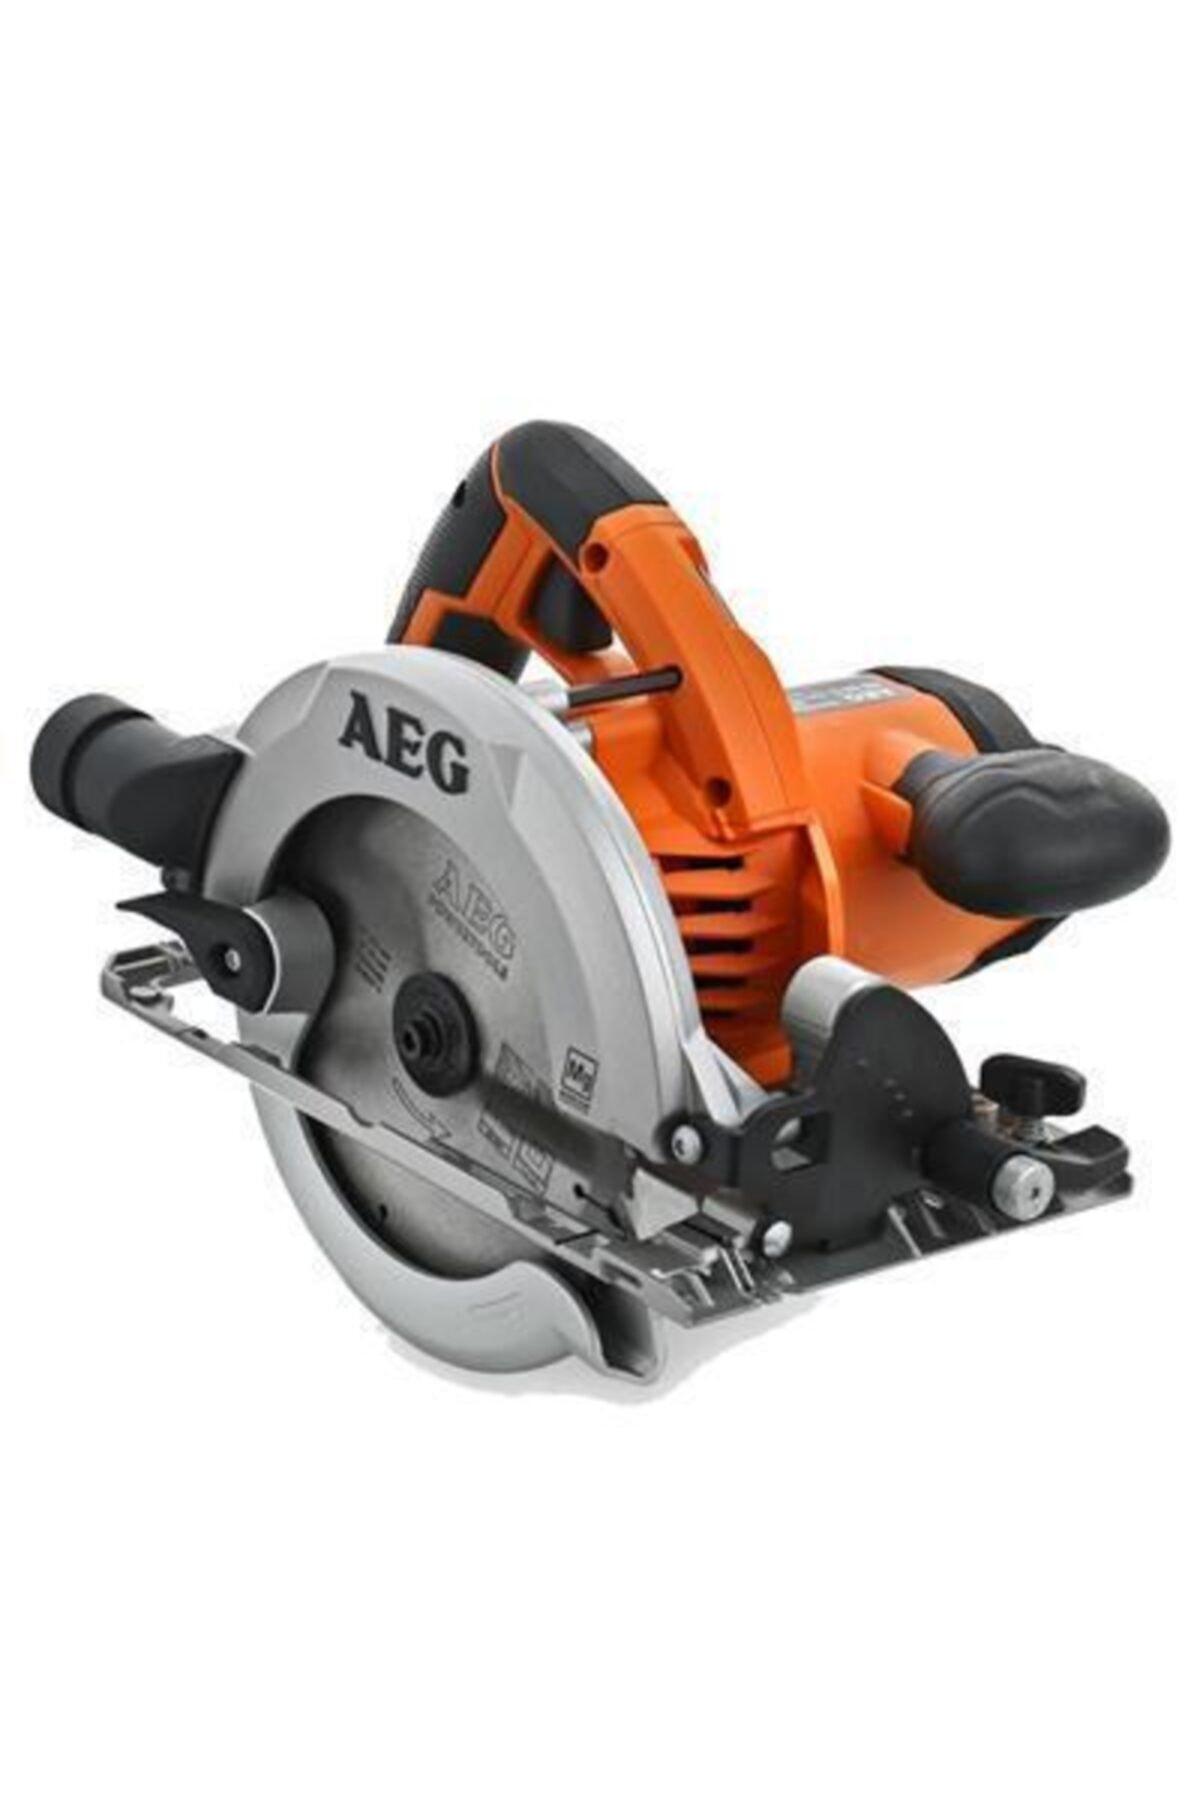 AEG KS 55 2 Sunta Kesme Testeresi 1200Watt 165 mm 1